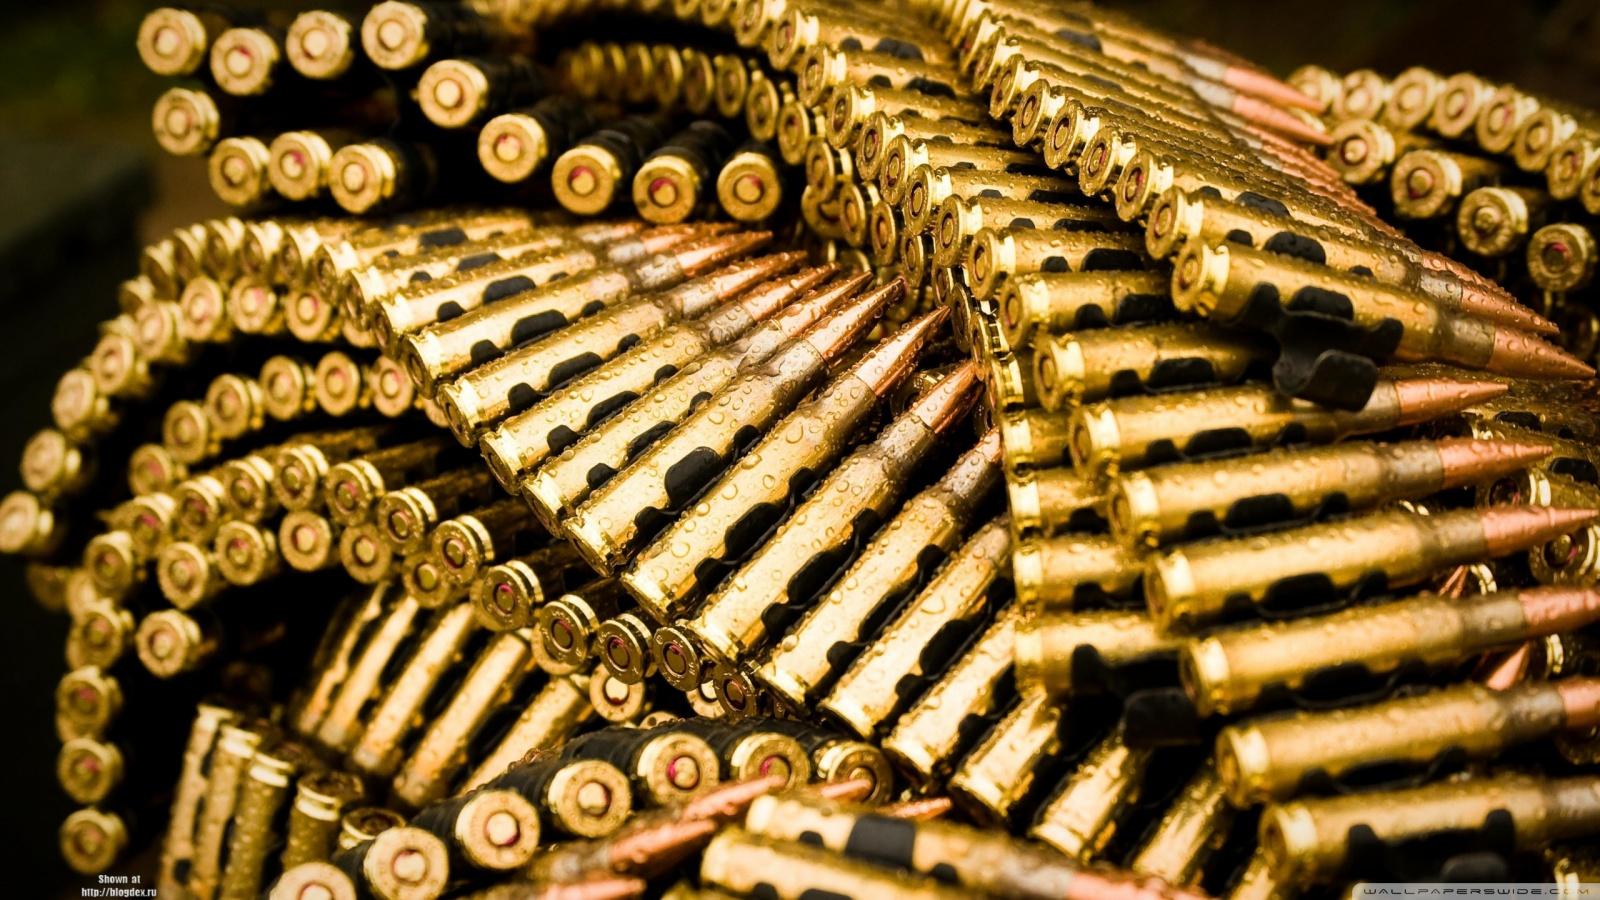 GUN vs GUTS: BULLET CHAIN HD WALLPAPER